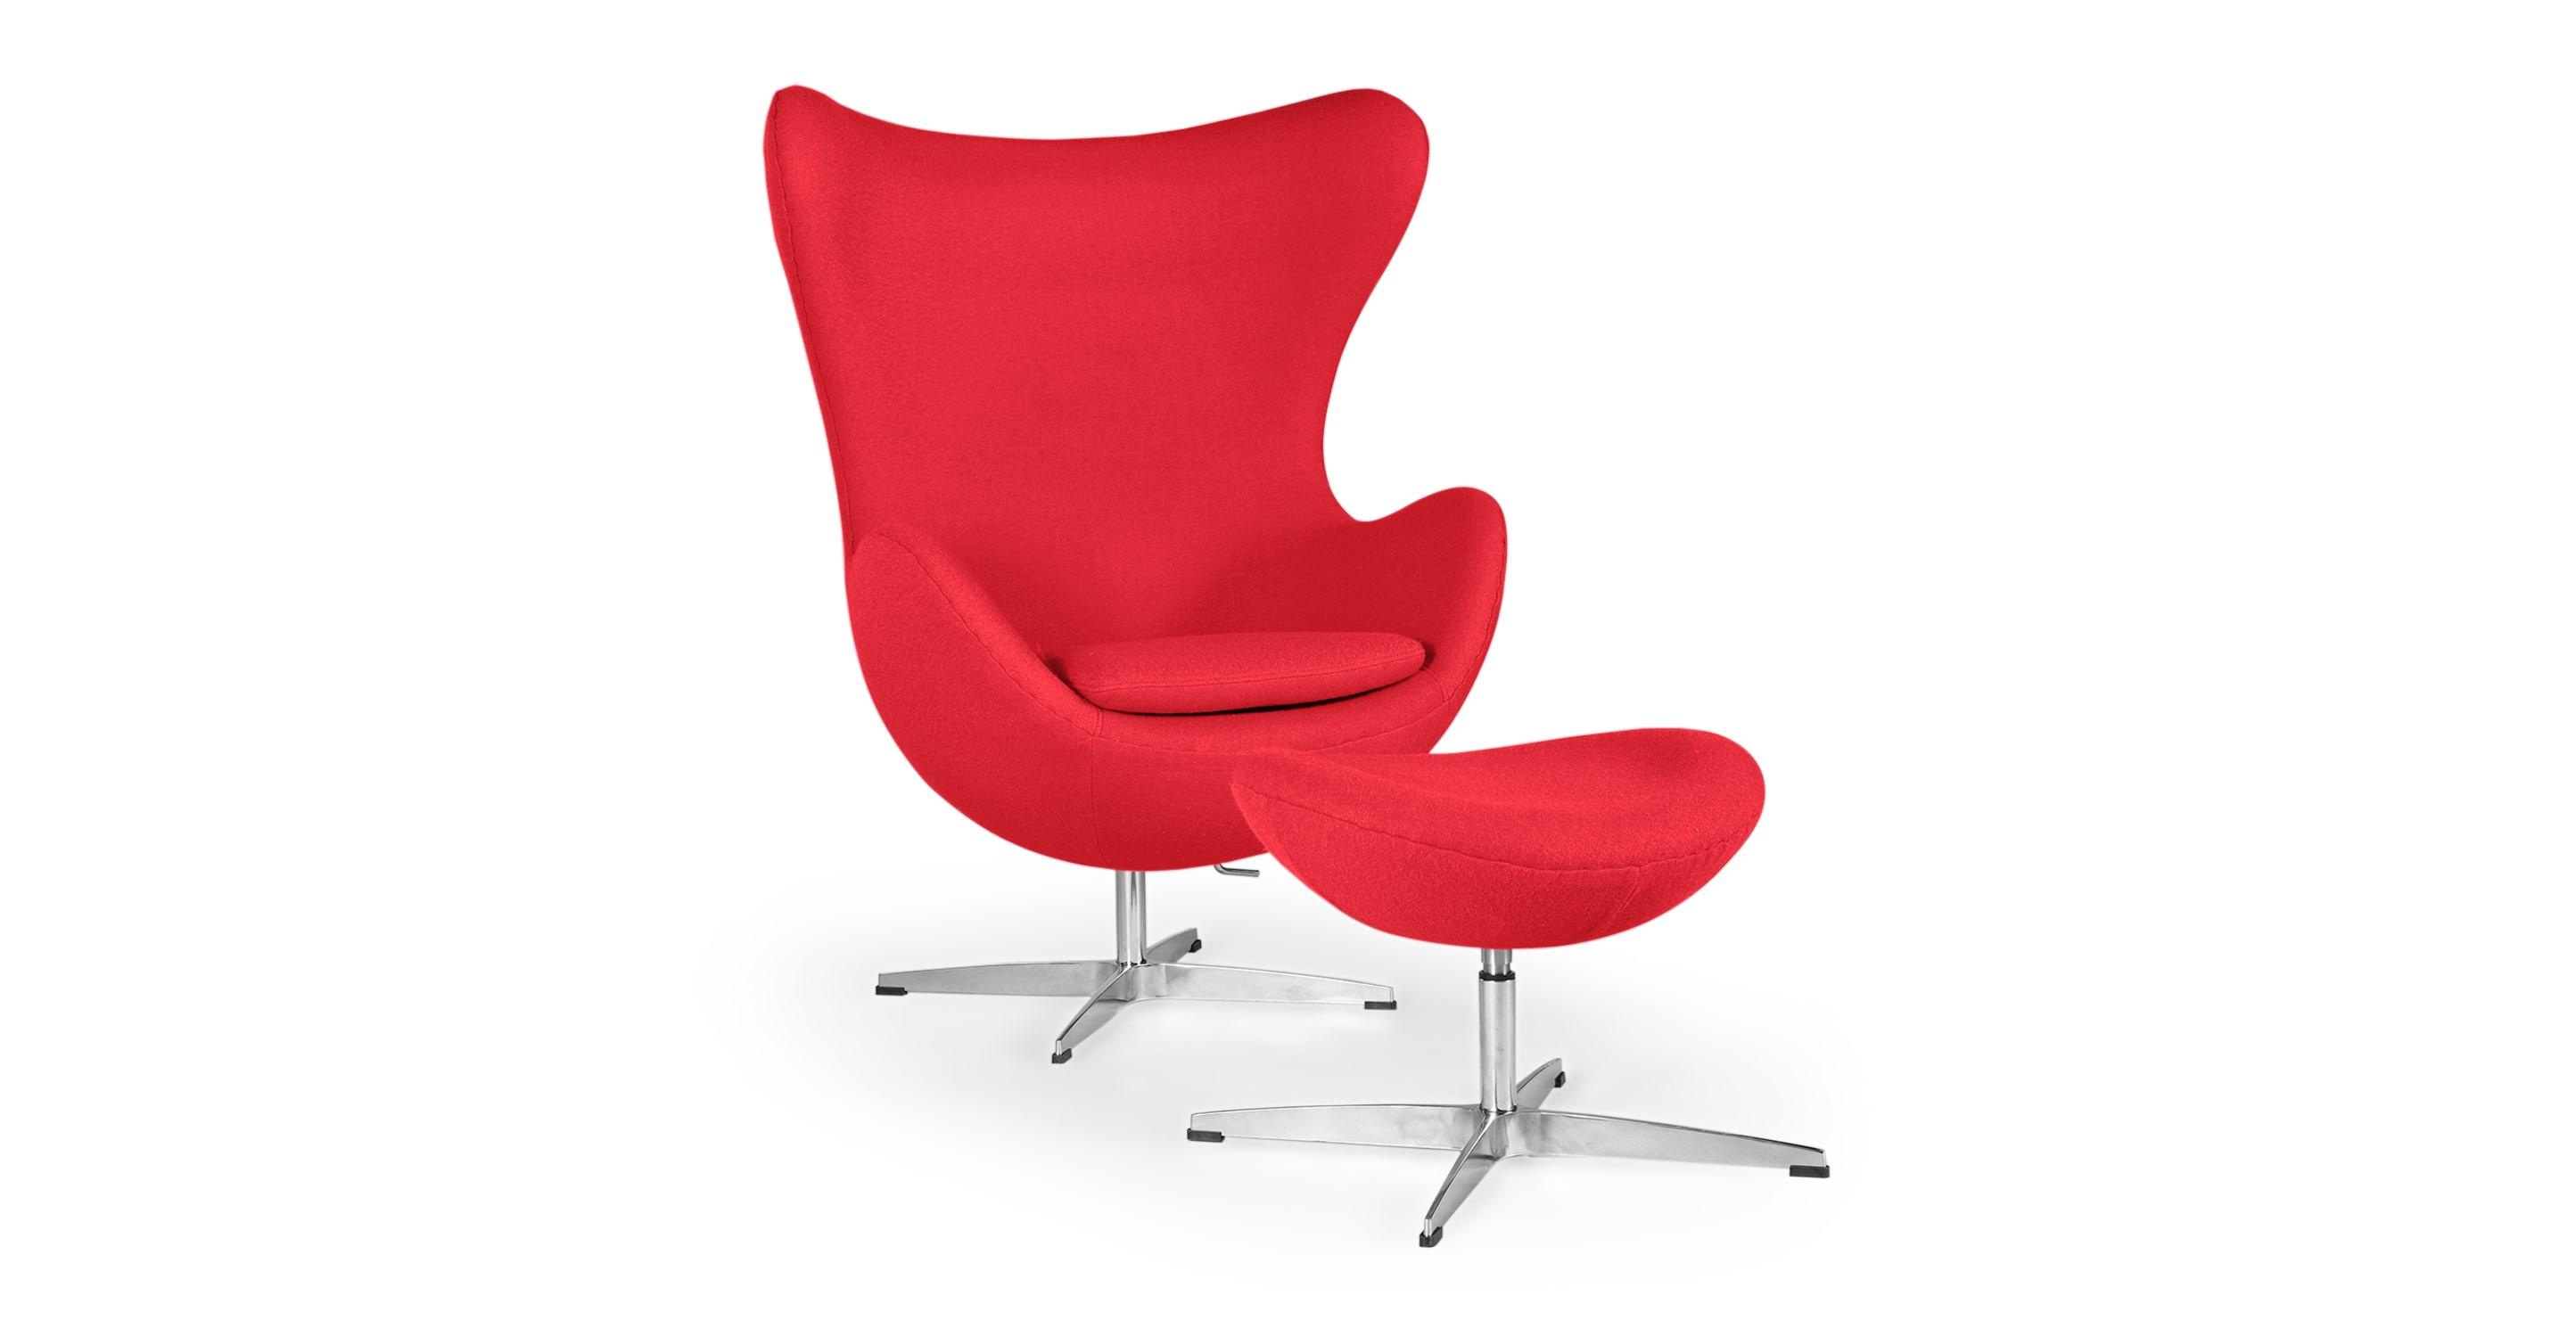 Amoeba Swivel Fabric Chair & Ottoman, Cherry Red